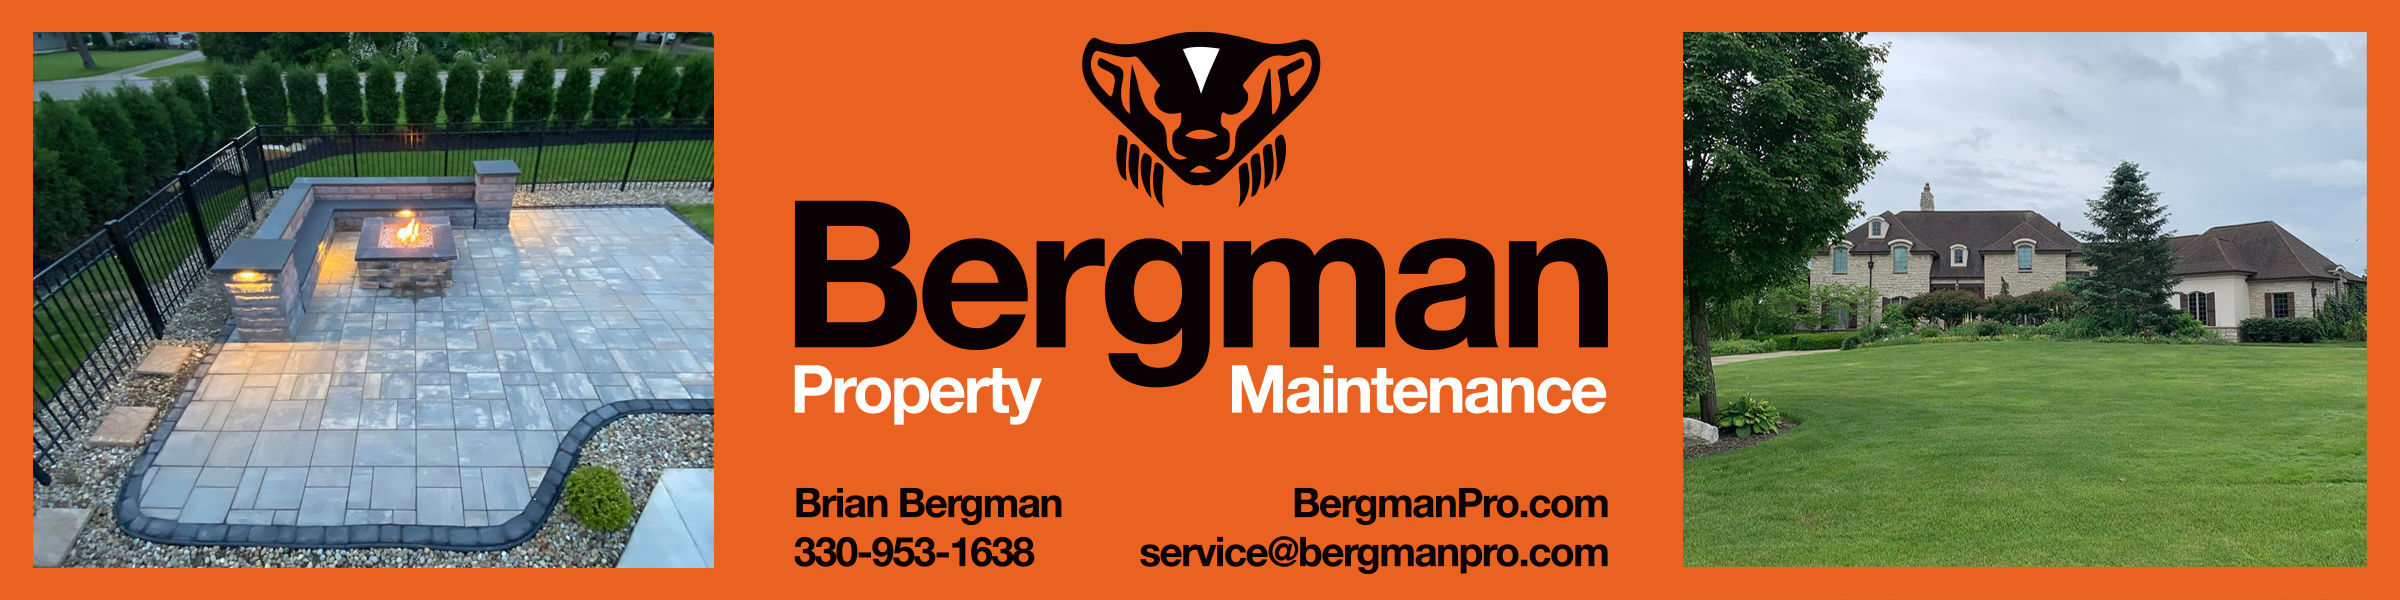 Bergman Property Maintenance